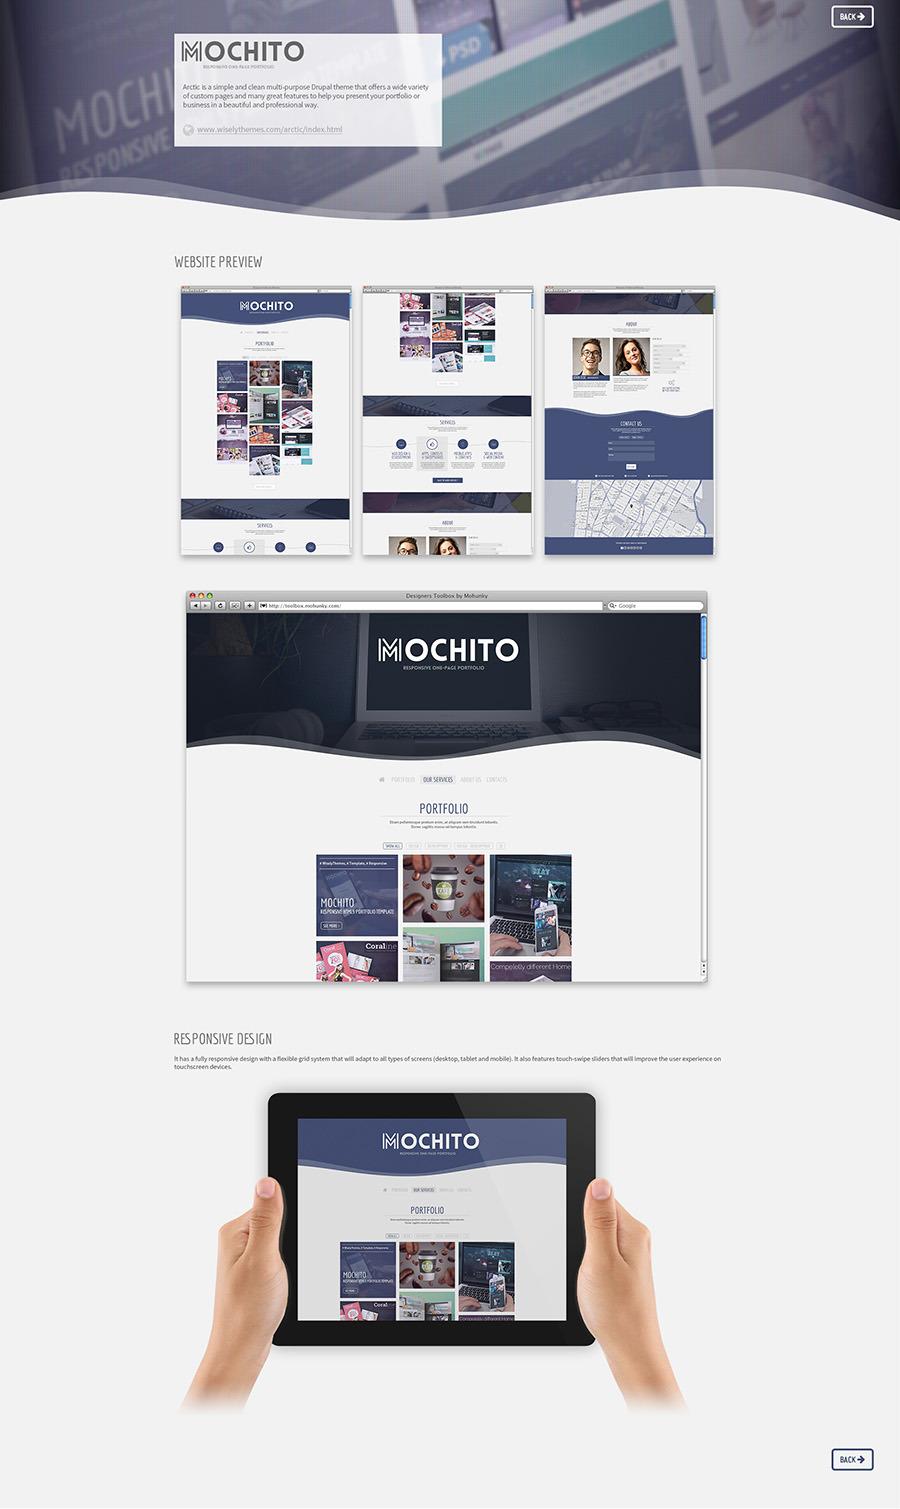 mochito responsive onepage portfolio template by wiselythemes mochito responsive onepage portfolio template